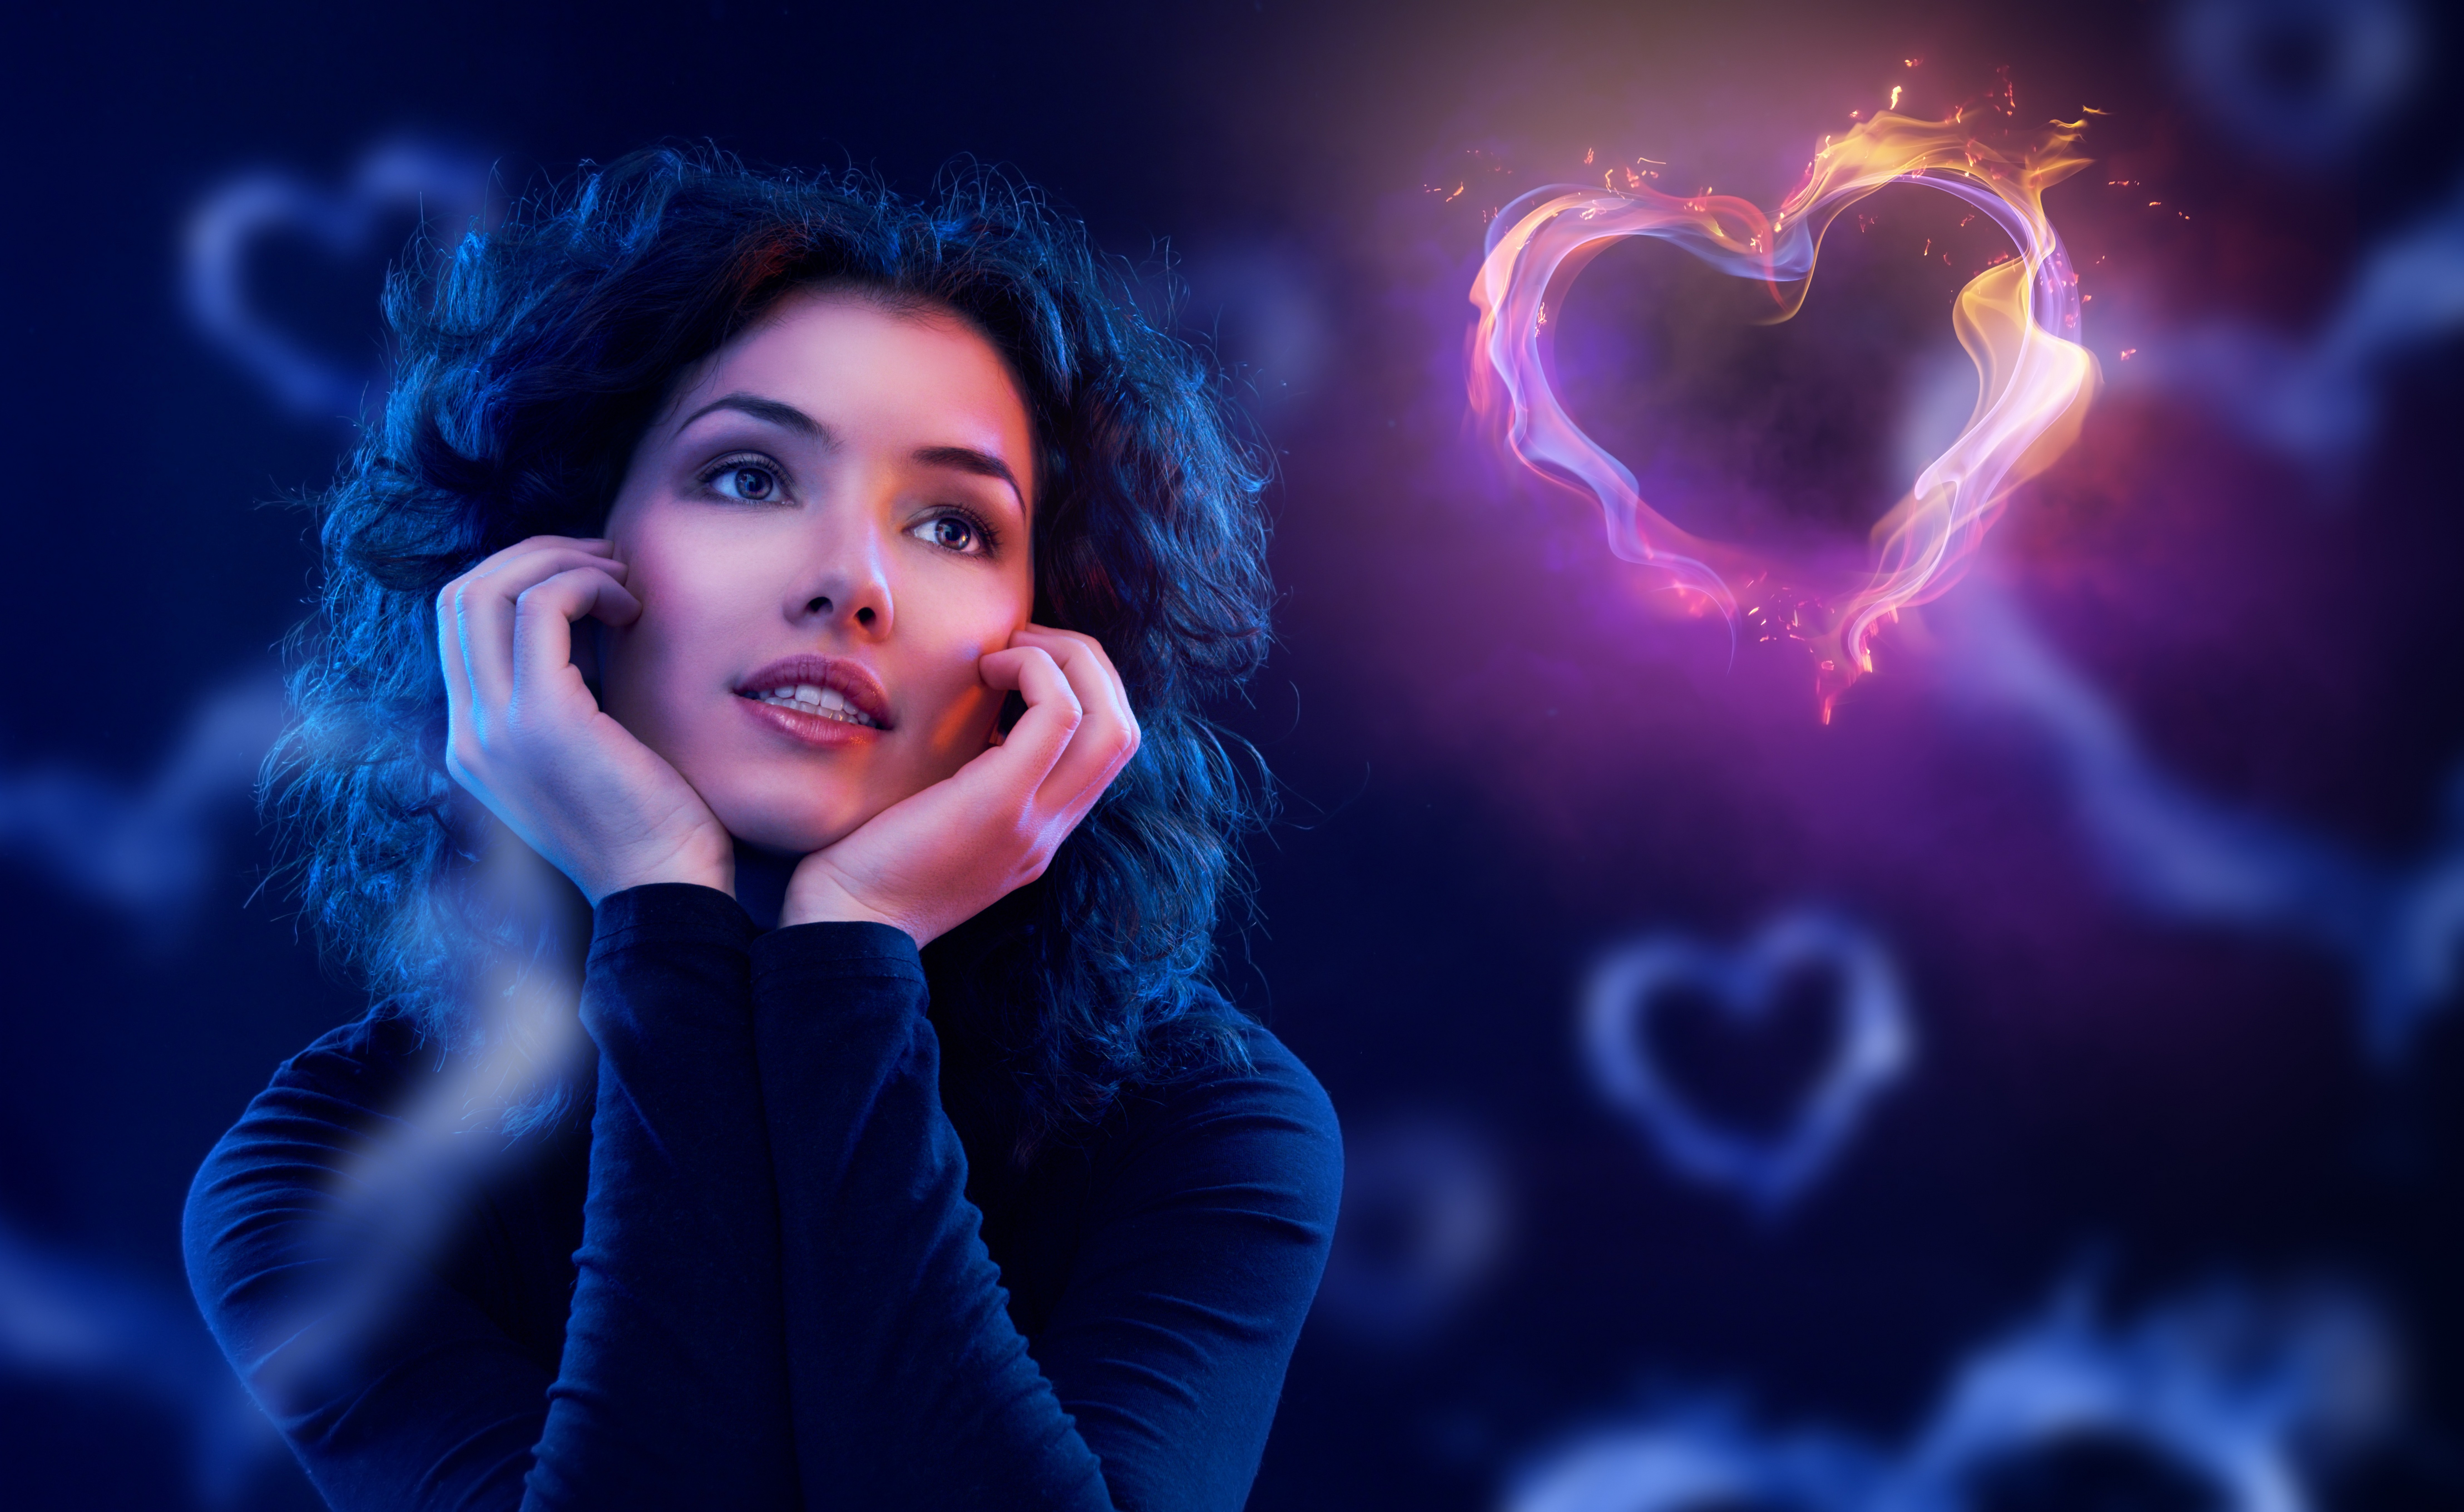 Сердце девушка обнимка  № 1659748 без смс